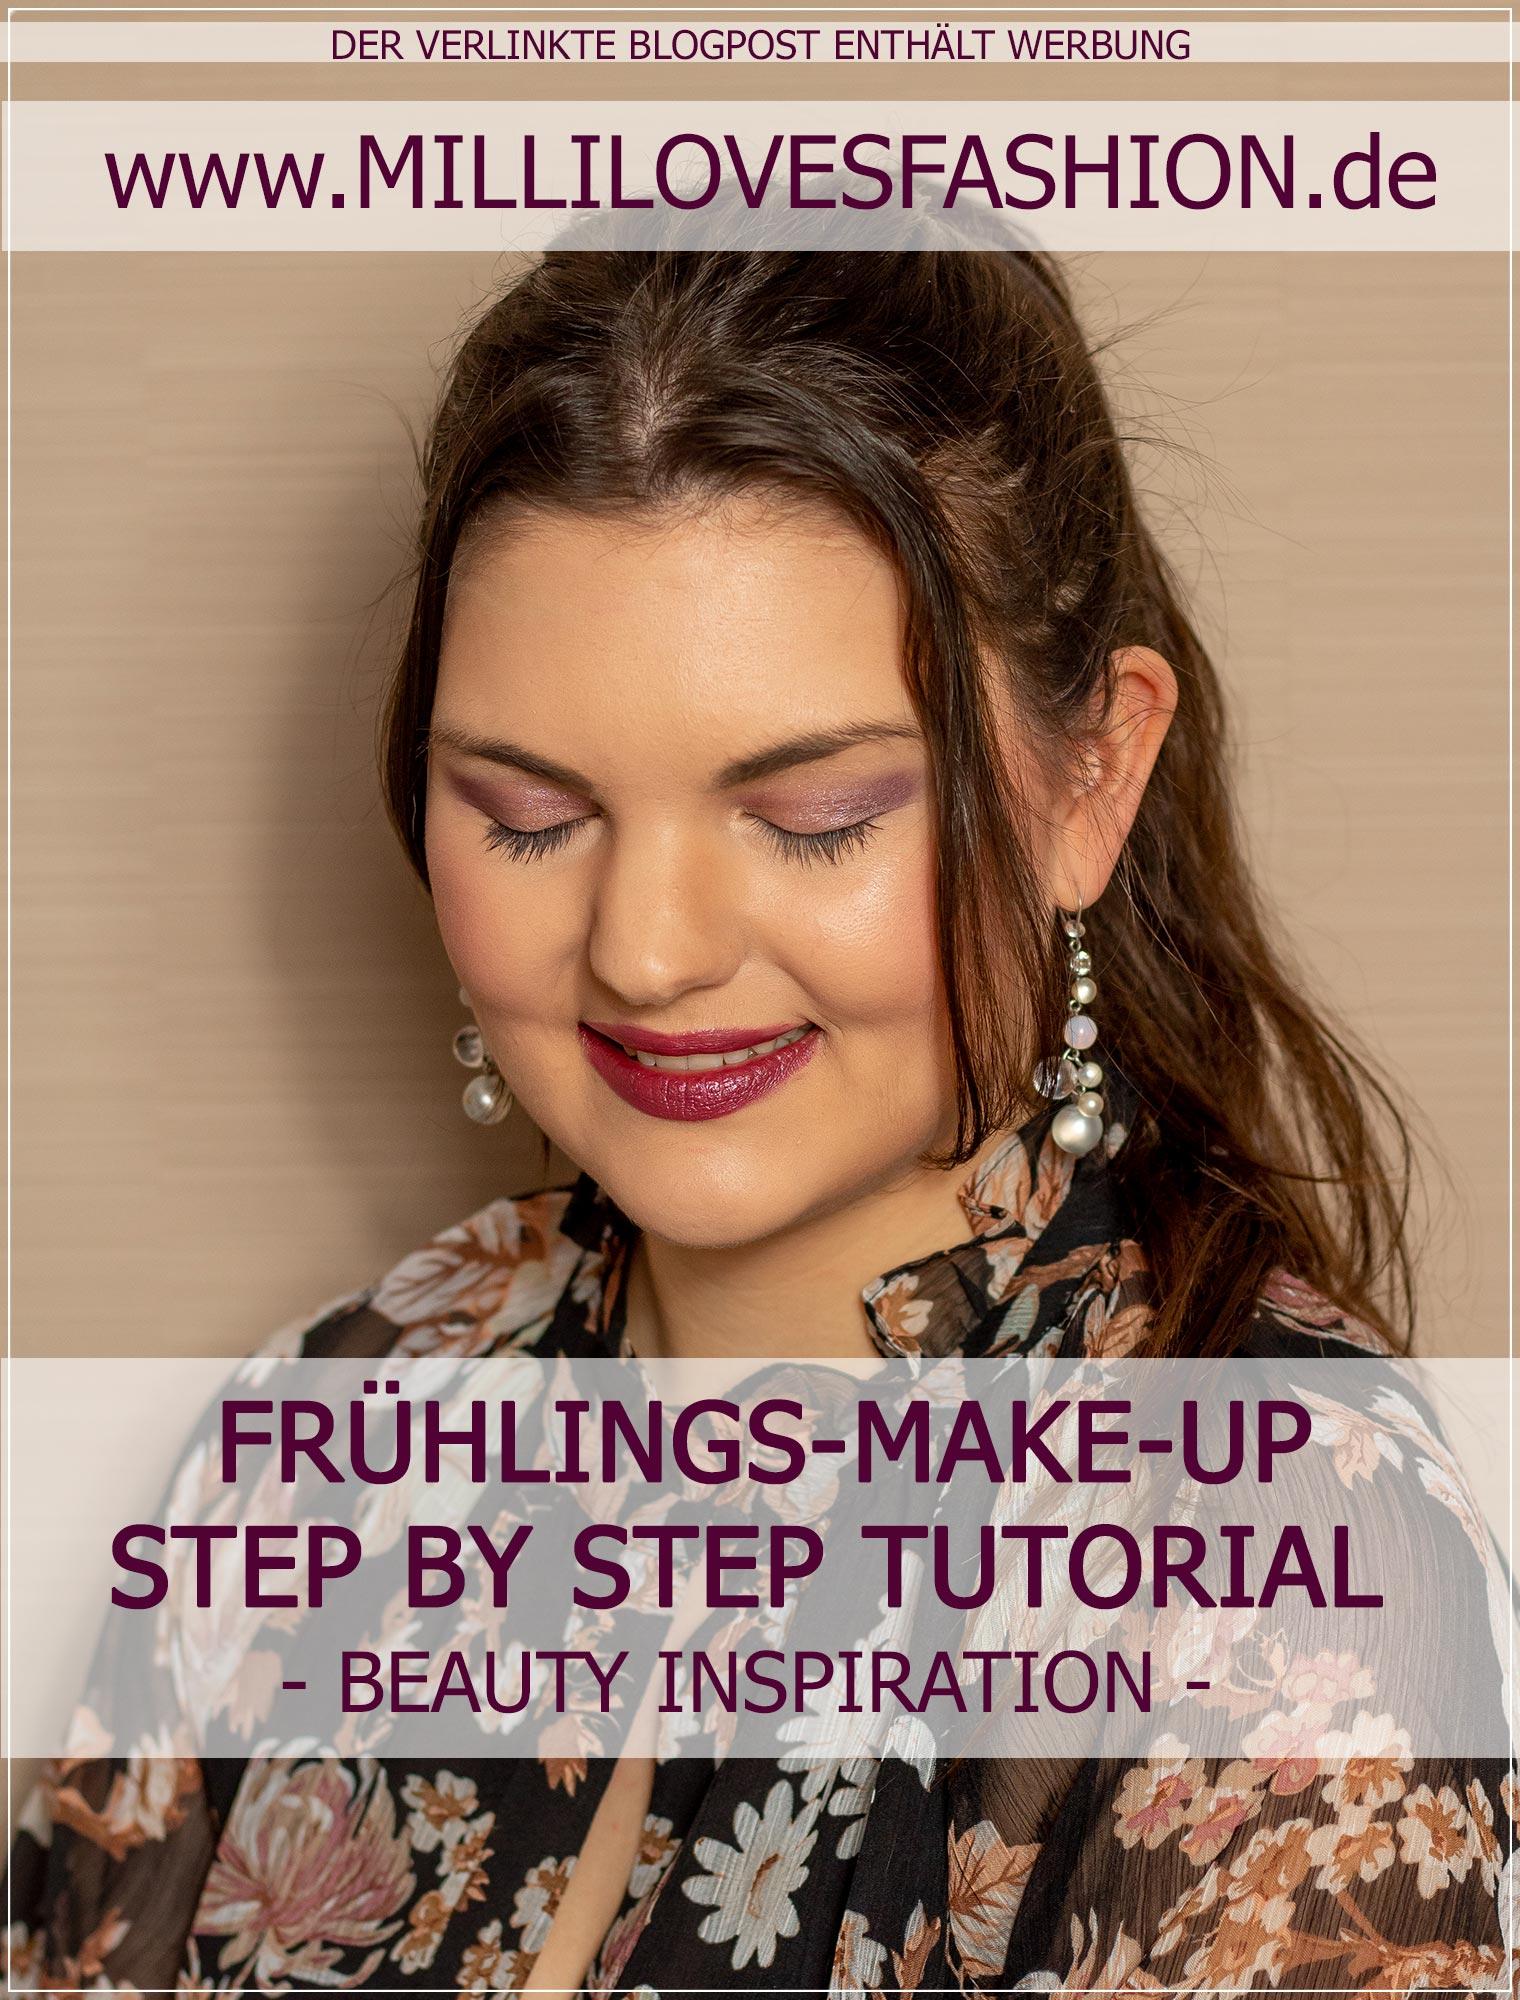 Frühlings-Make-Up als Step by Step Anleitung mit Flieder